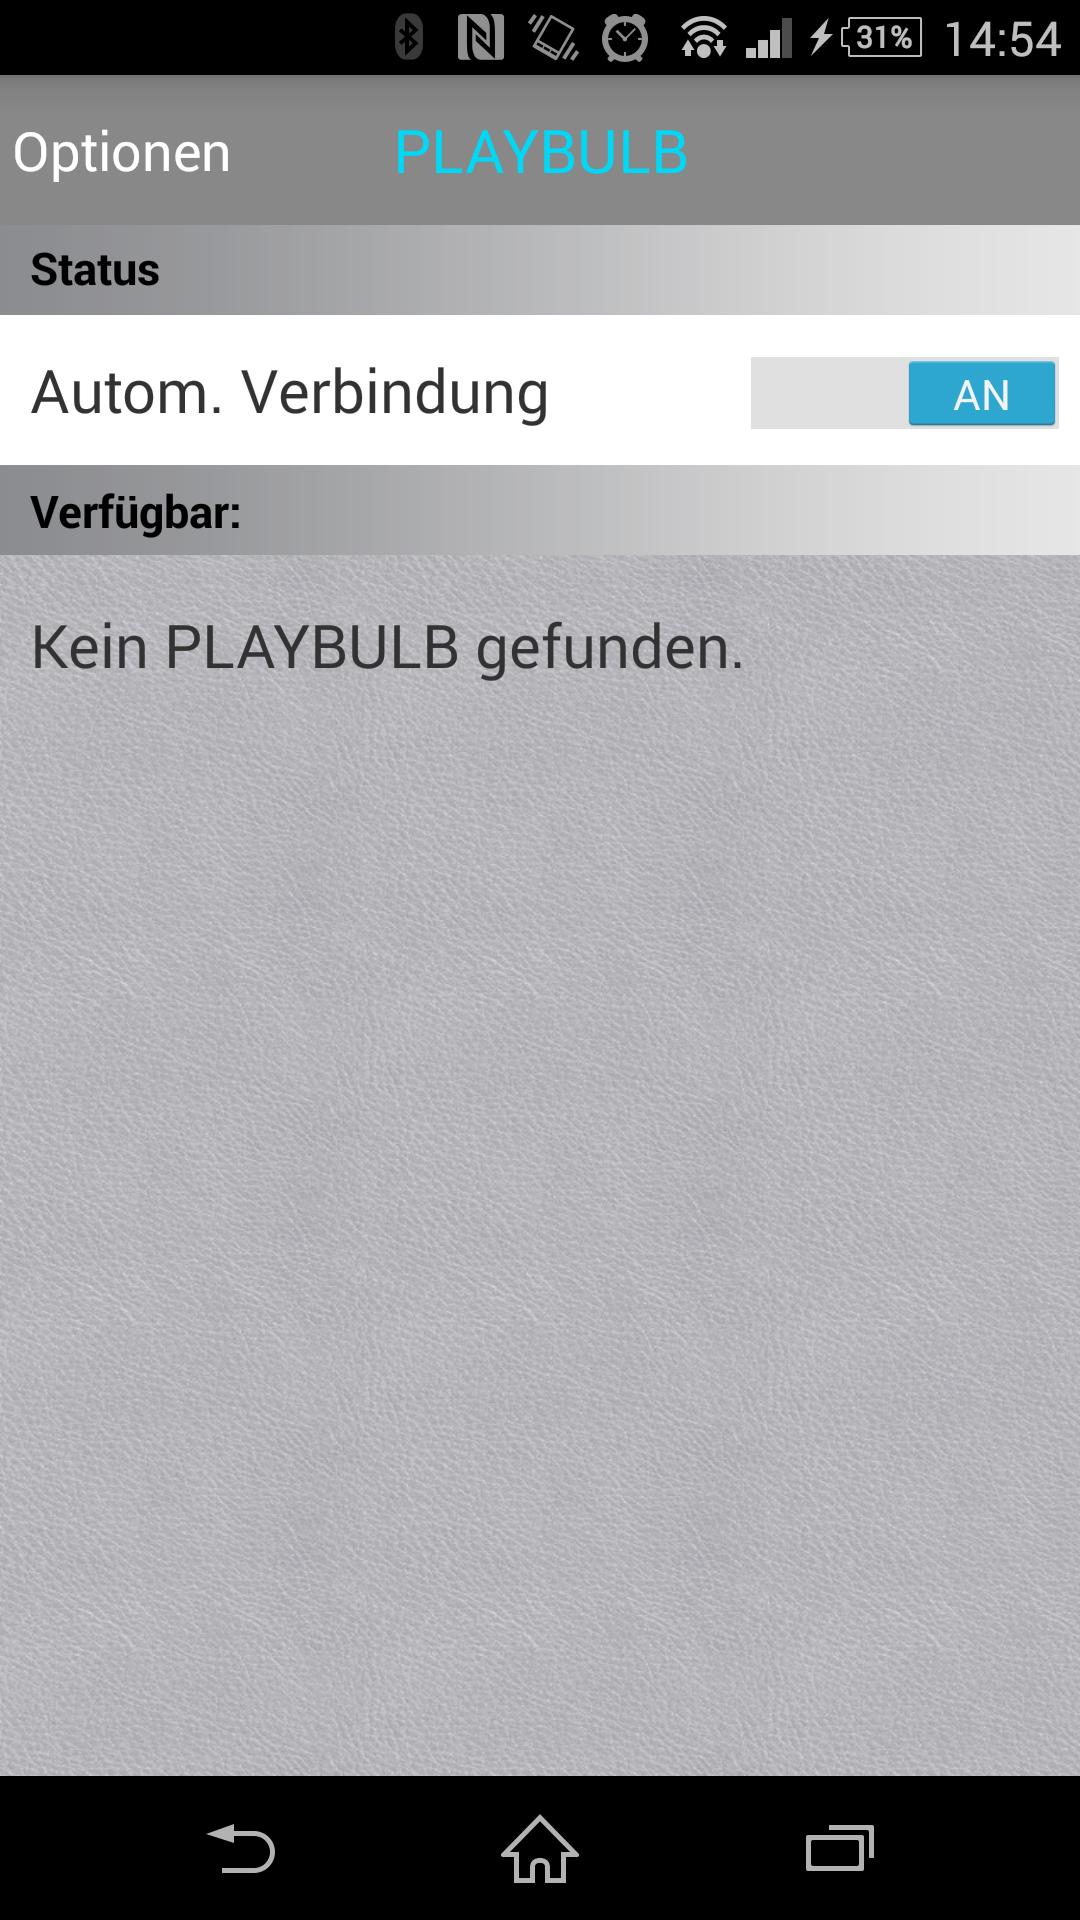 Playbulb-App-0 Spannende Lampen Per App Steuern Dekorationen